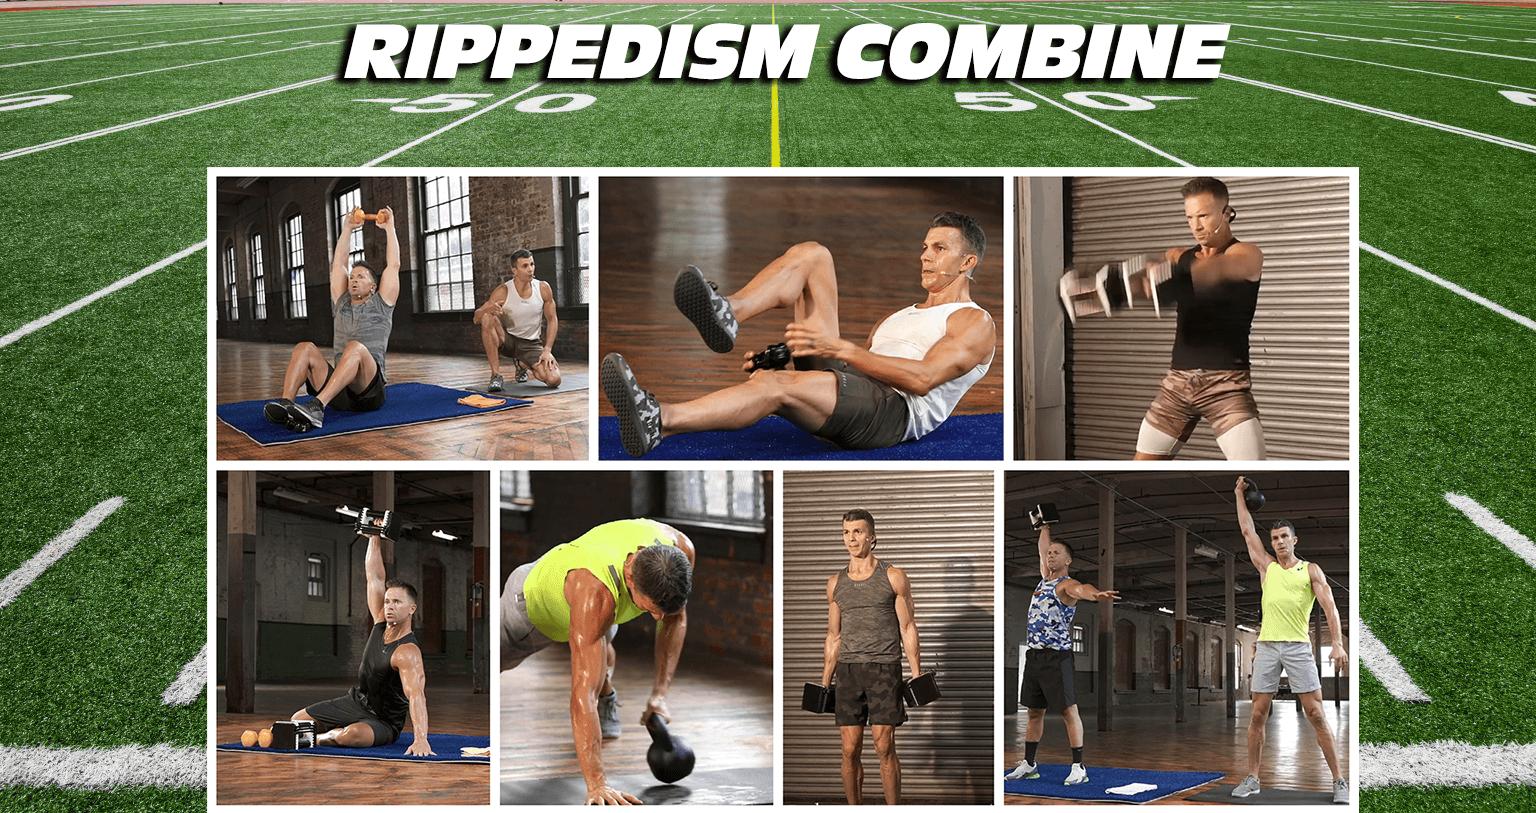 Rippedism Combine Workout Program